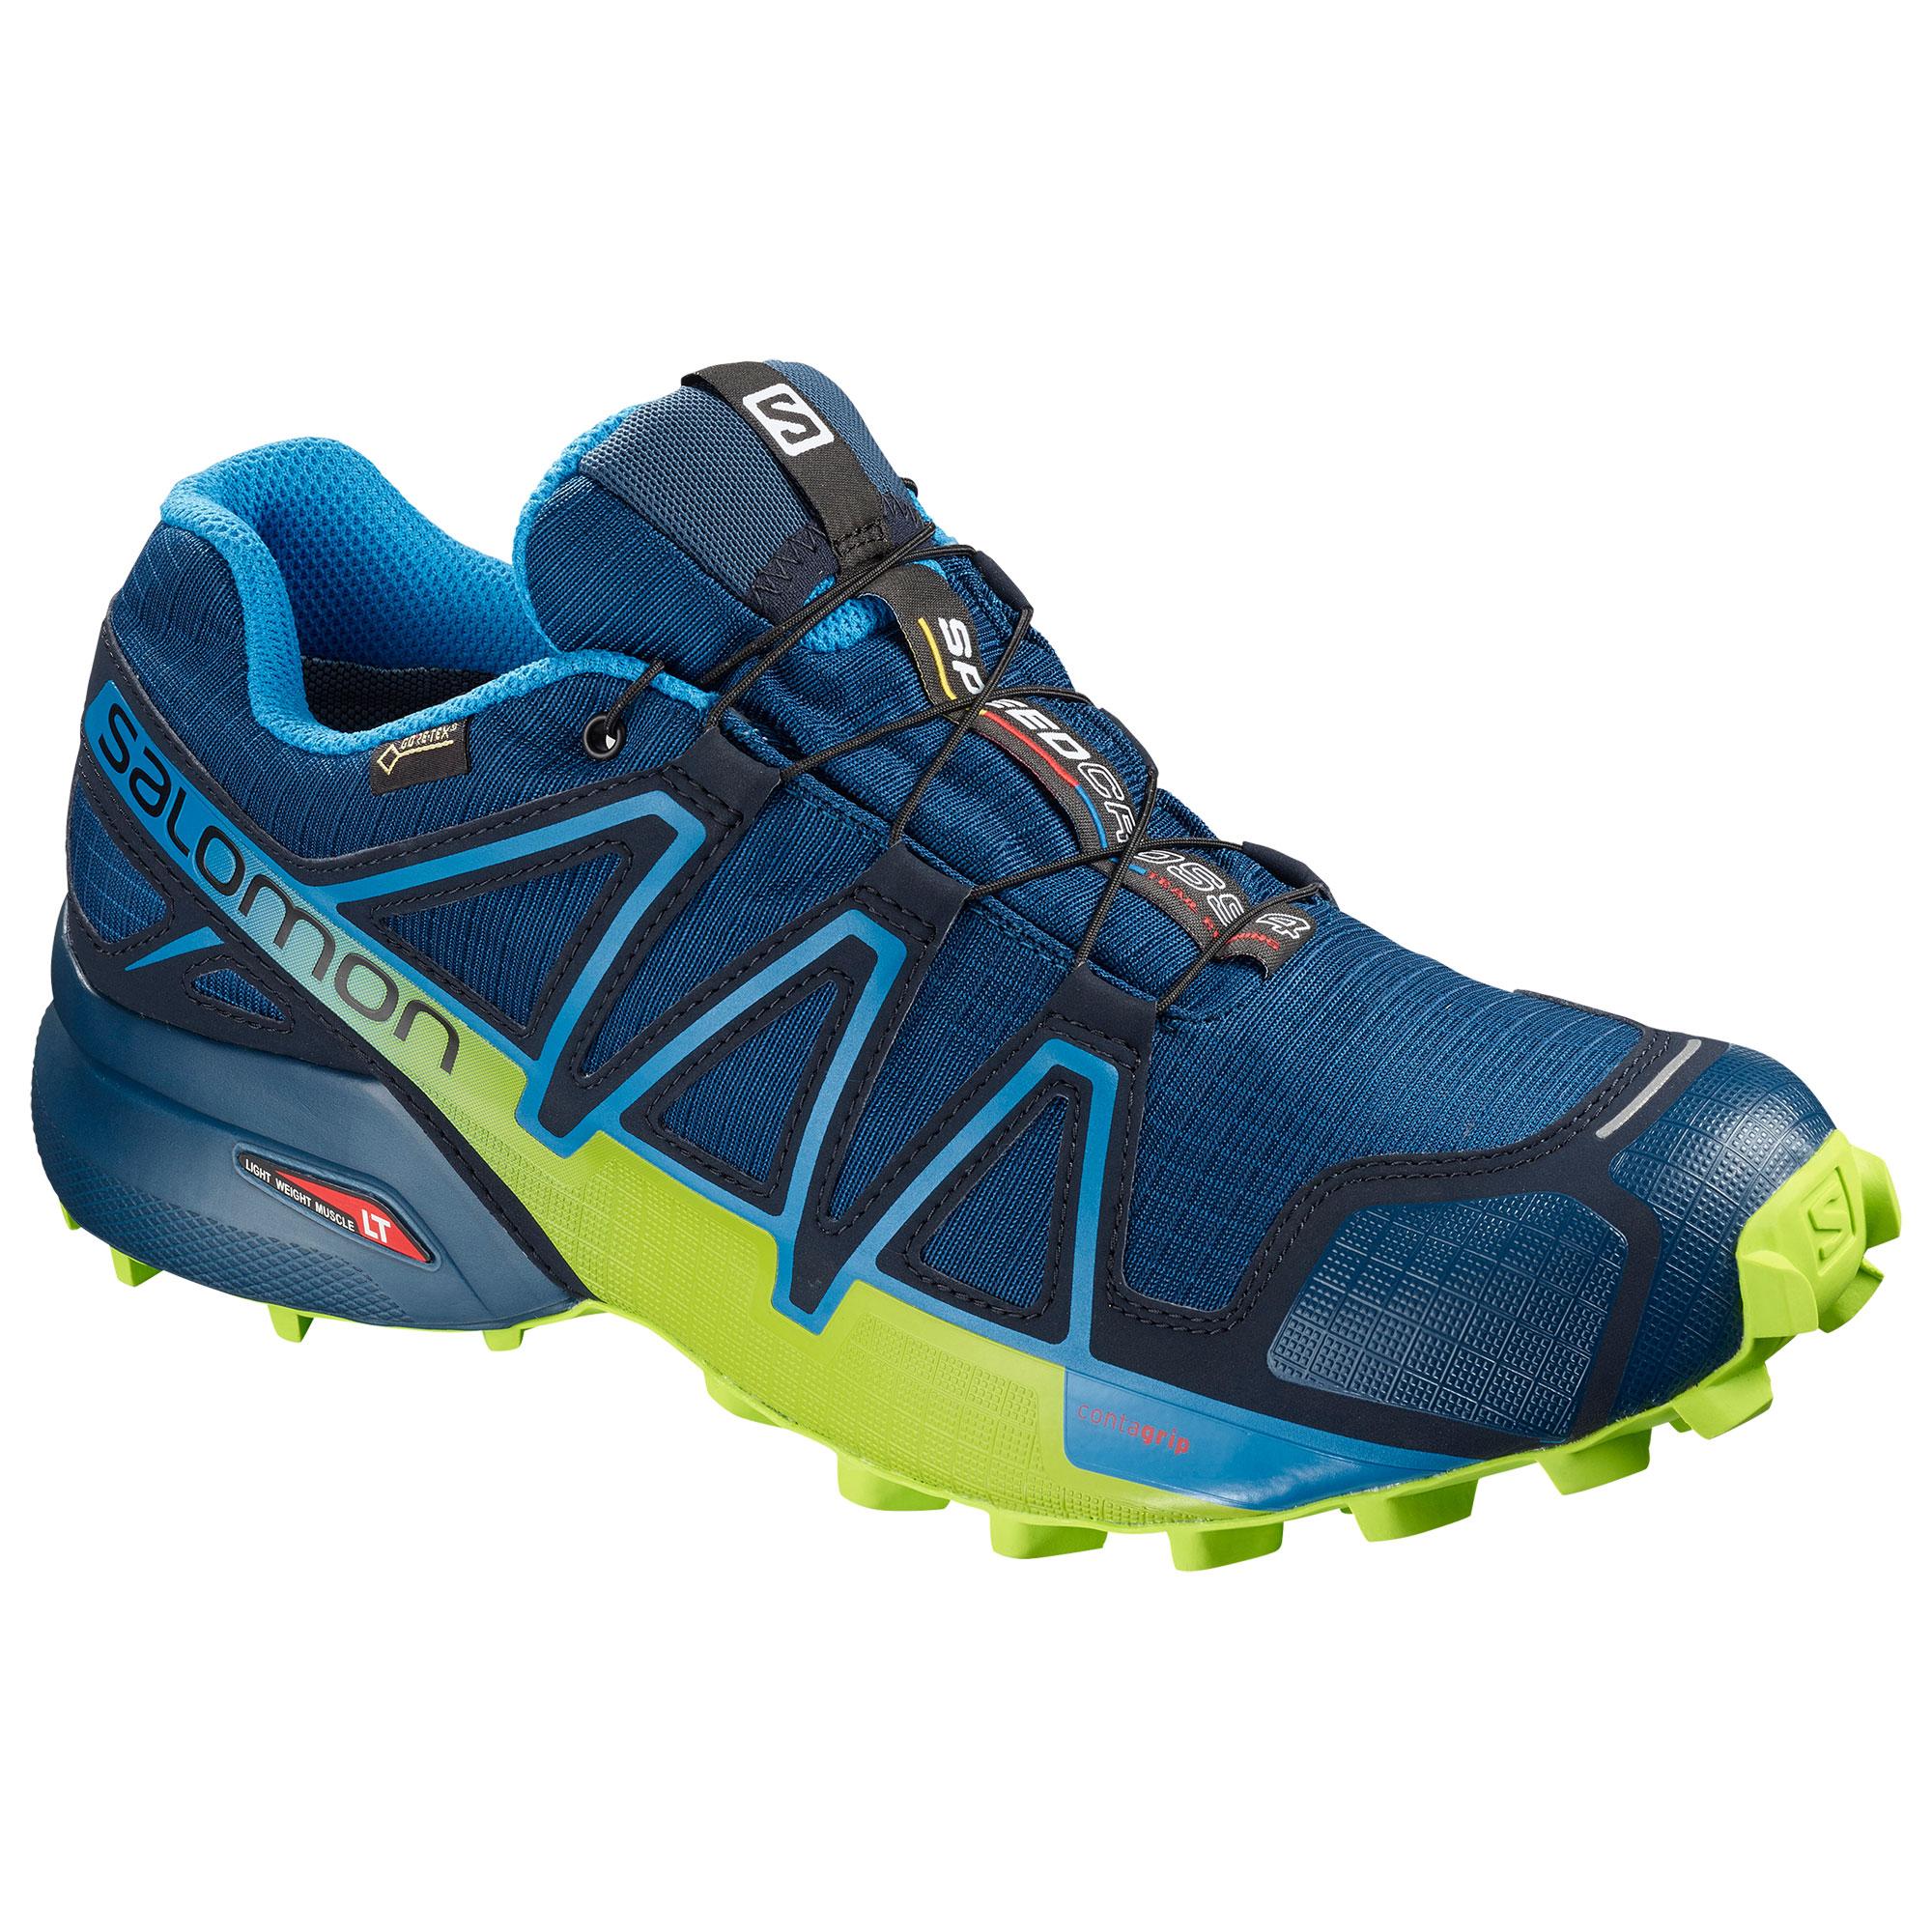 on sale 63ae6 8ca33 Salomon Speedcross 4 GTX Trail Running Shoe - Men's